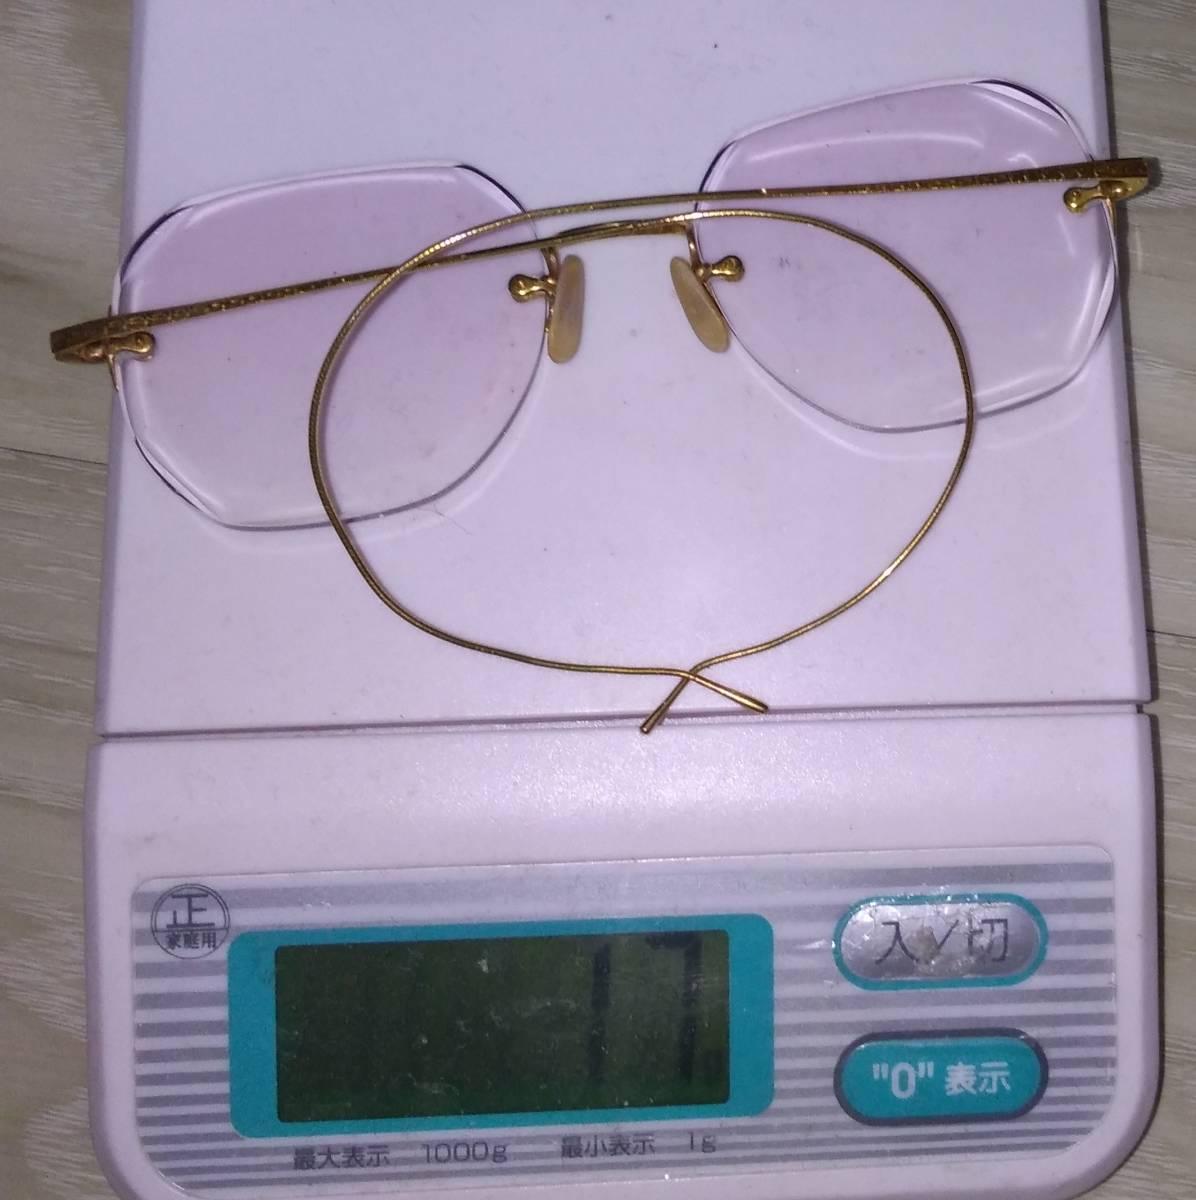 K18 無垢 メガネフレーム 18金 刻印 めがね 眼鏡 復古_画像8